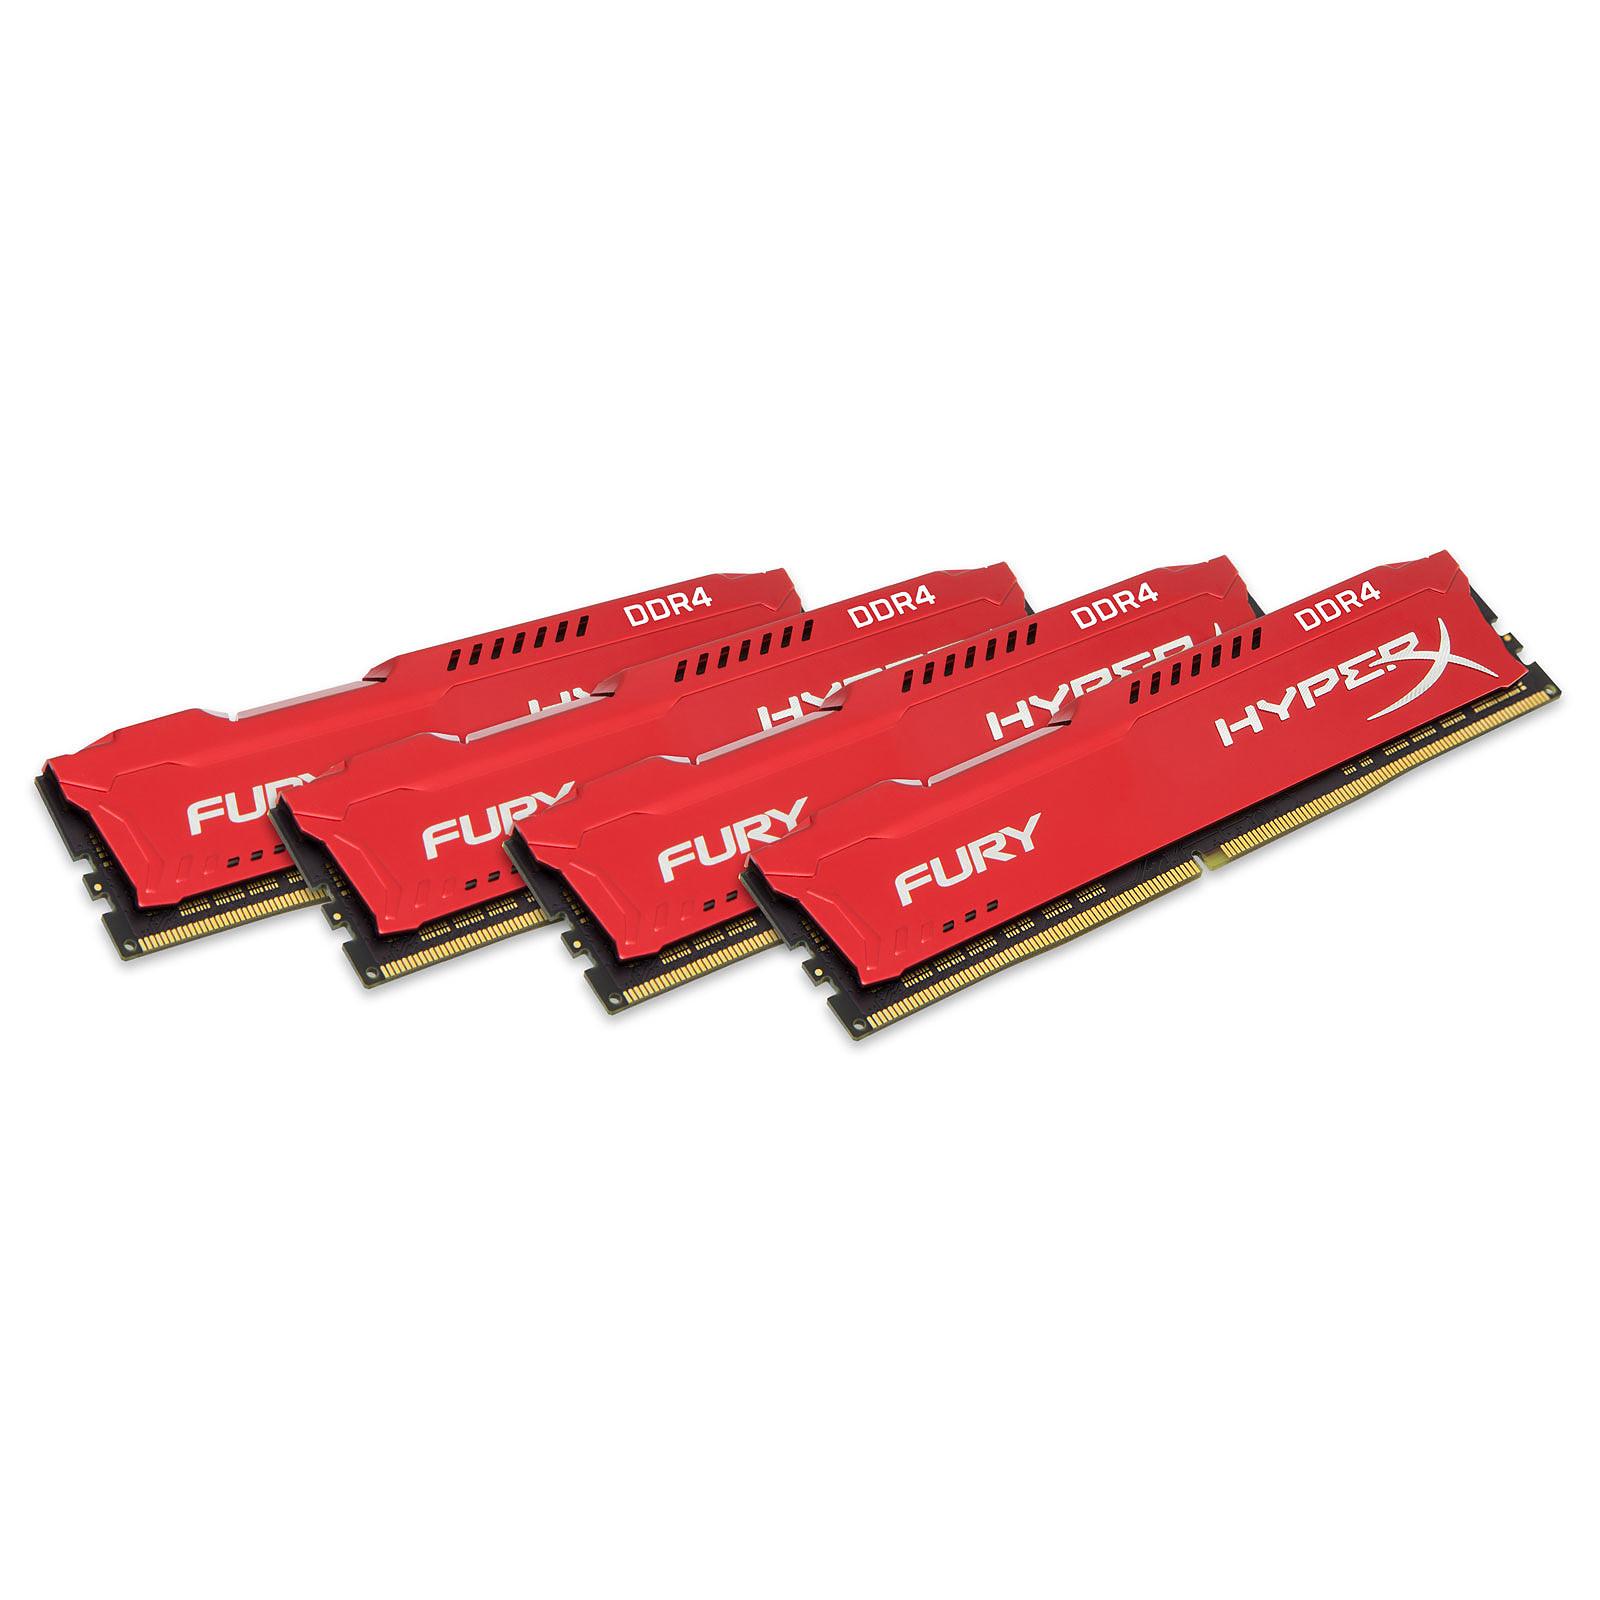 HyperX Fury Rouge 32 Go (4x 8 Go) DDR4 2133 MHz CL14